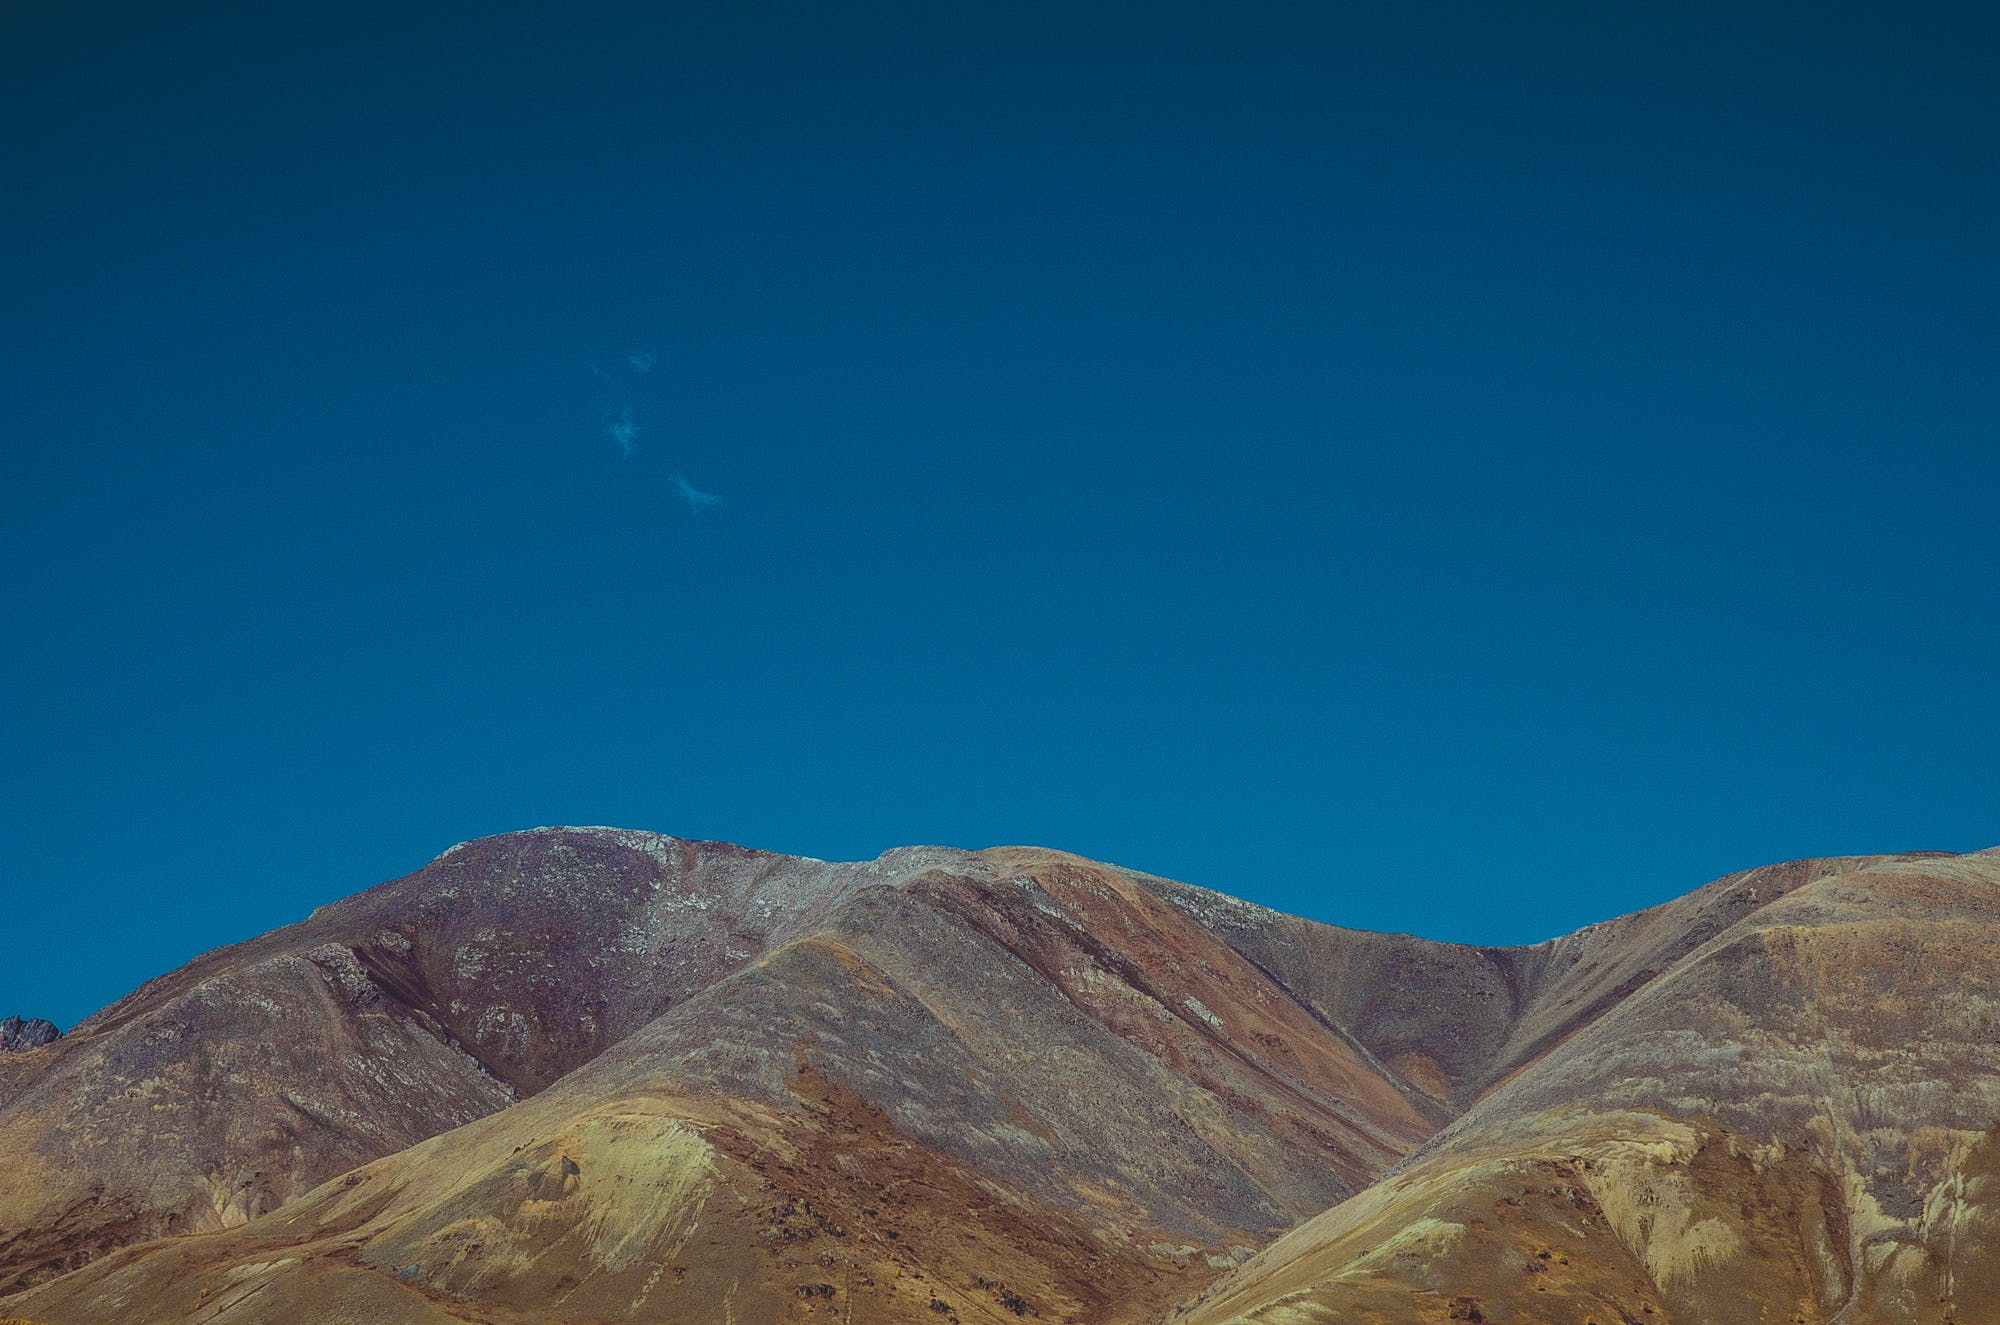 Free stock photo of синий, горы, голубое небо, небо